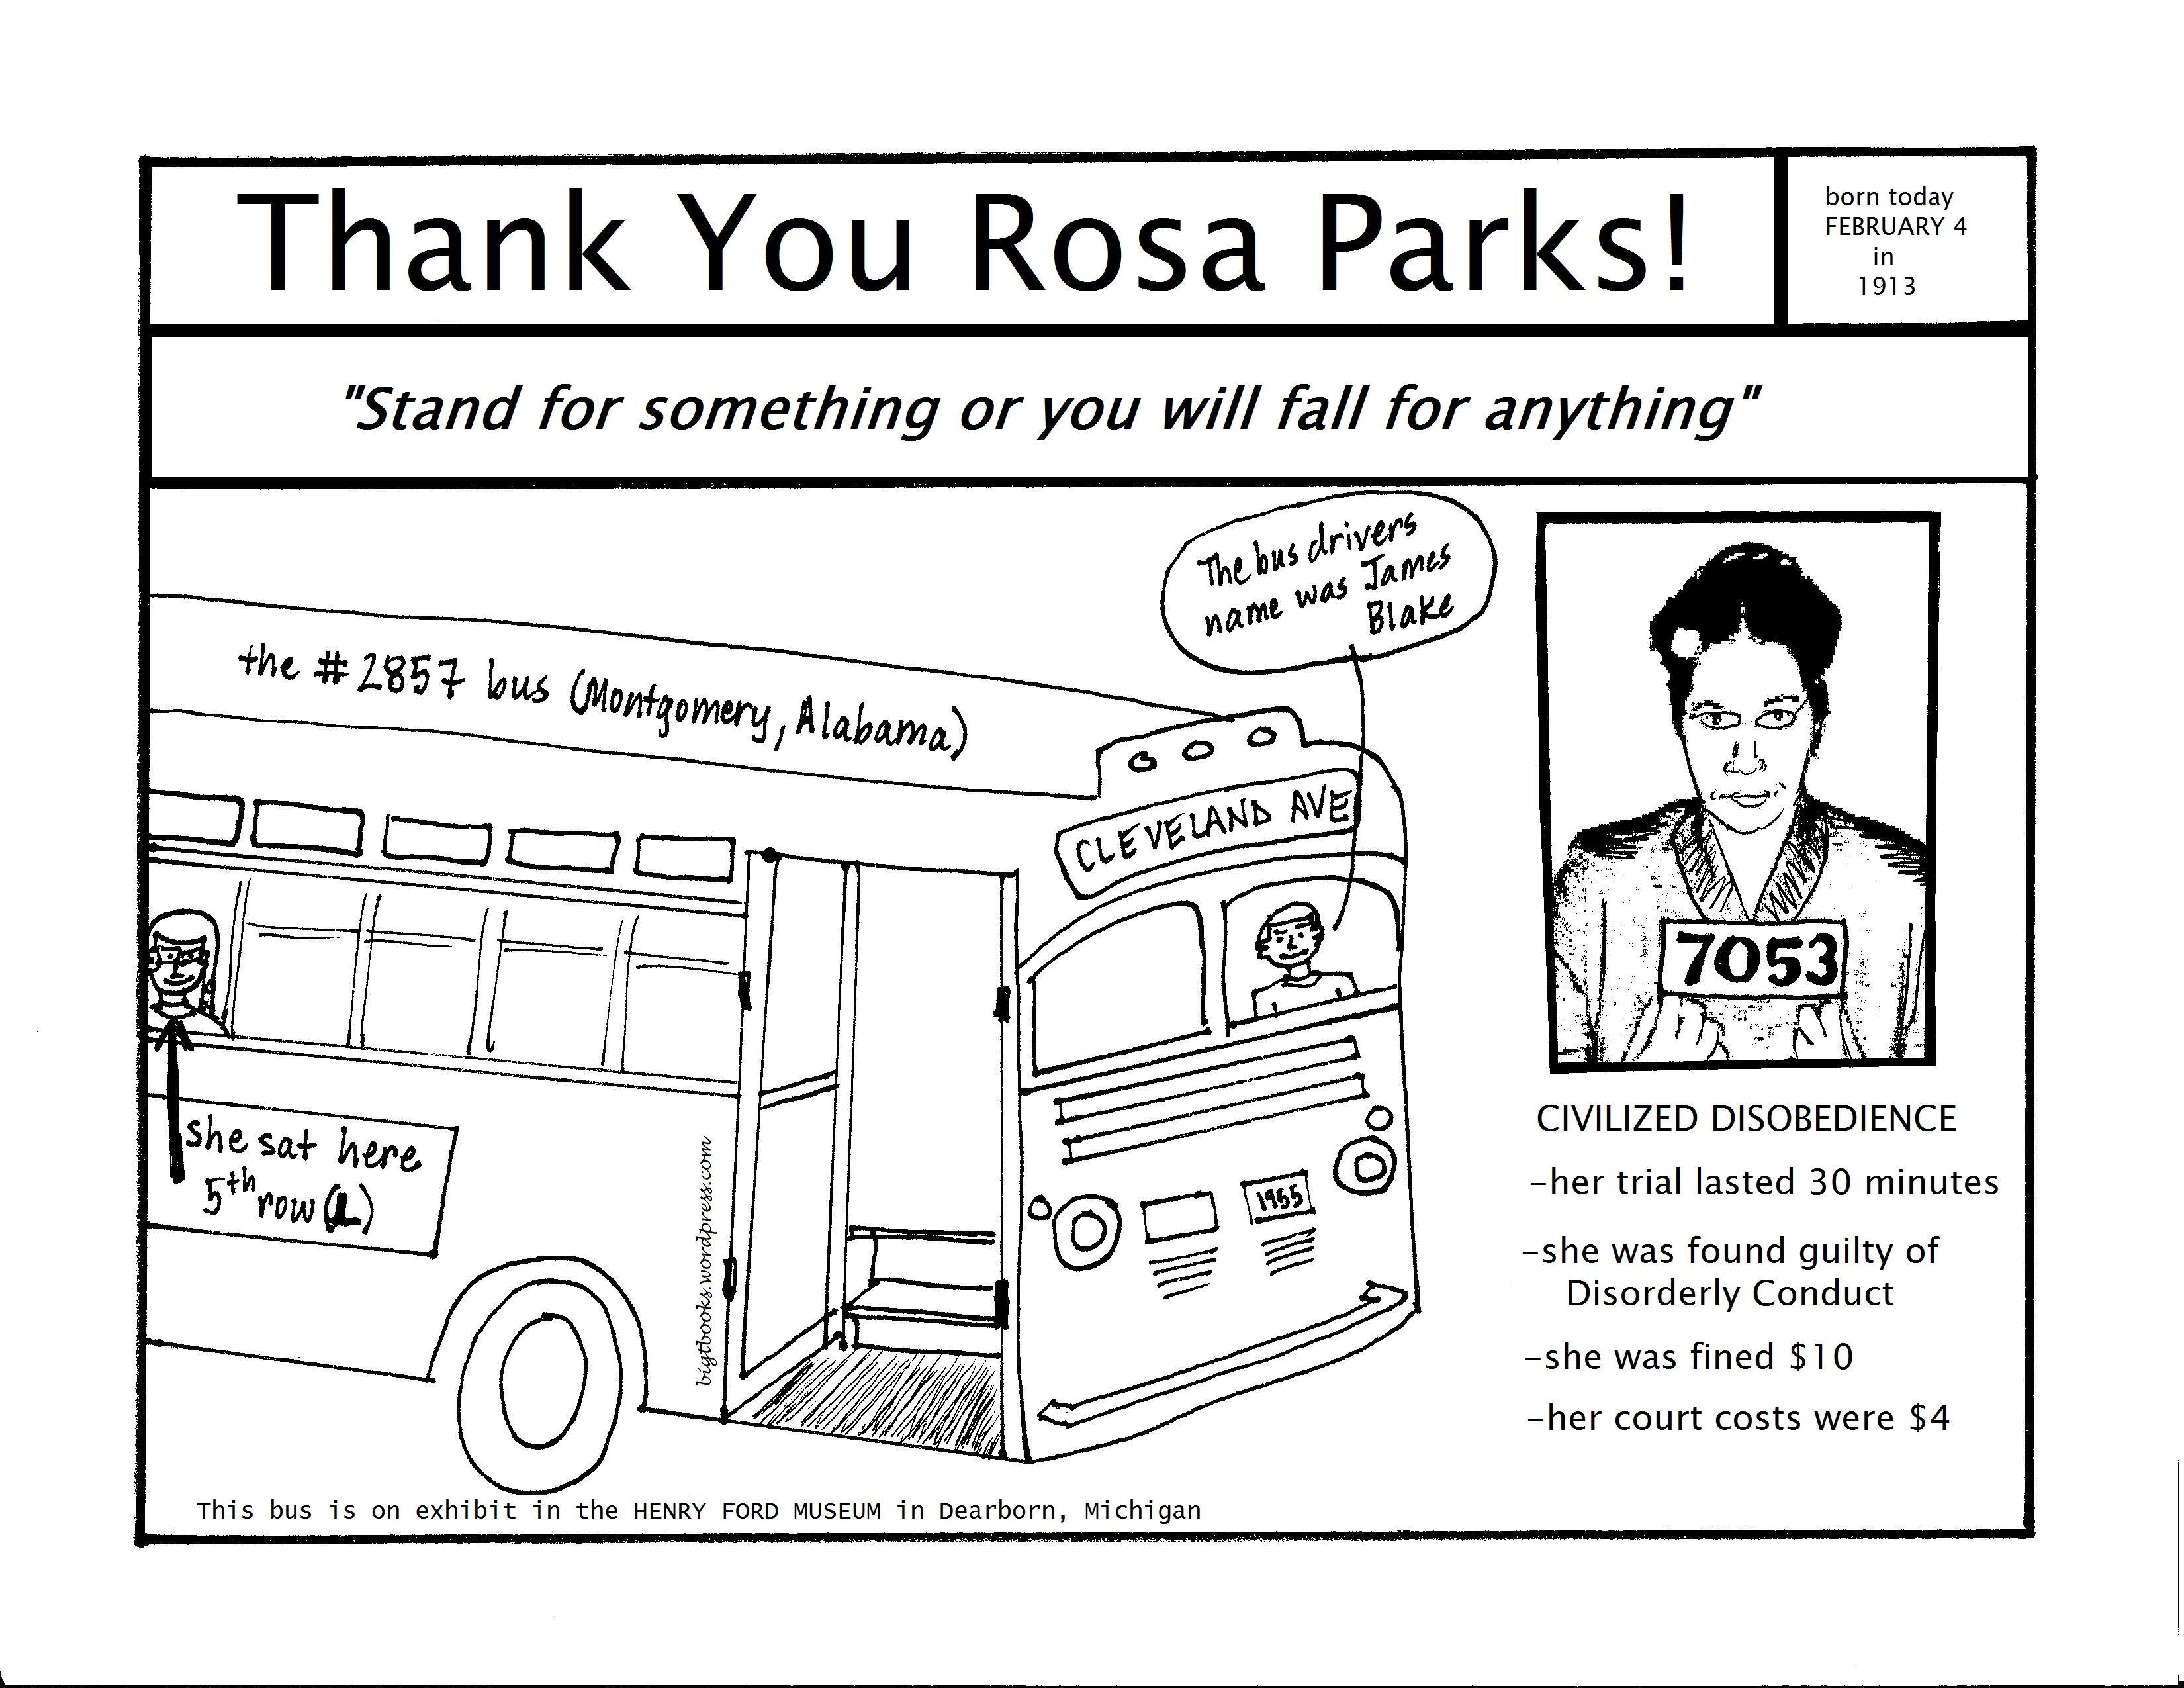 Rosa Parks Coloring Page Rosa Parks Coloring Pages Black Power